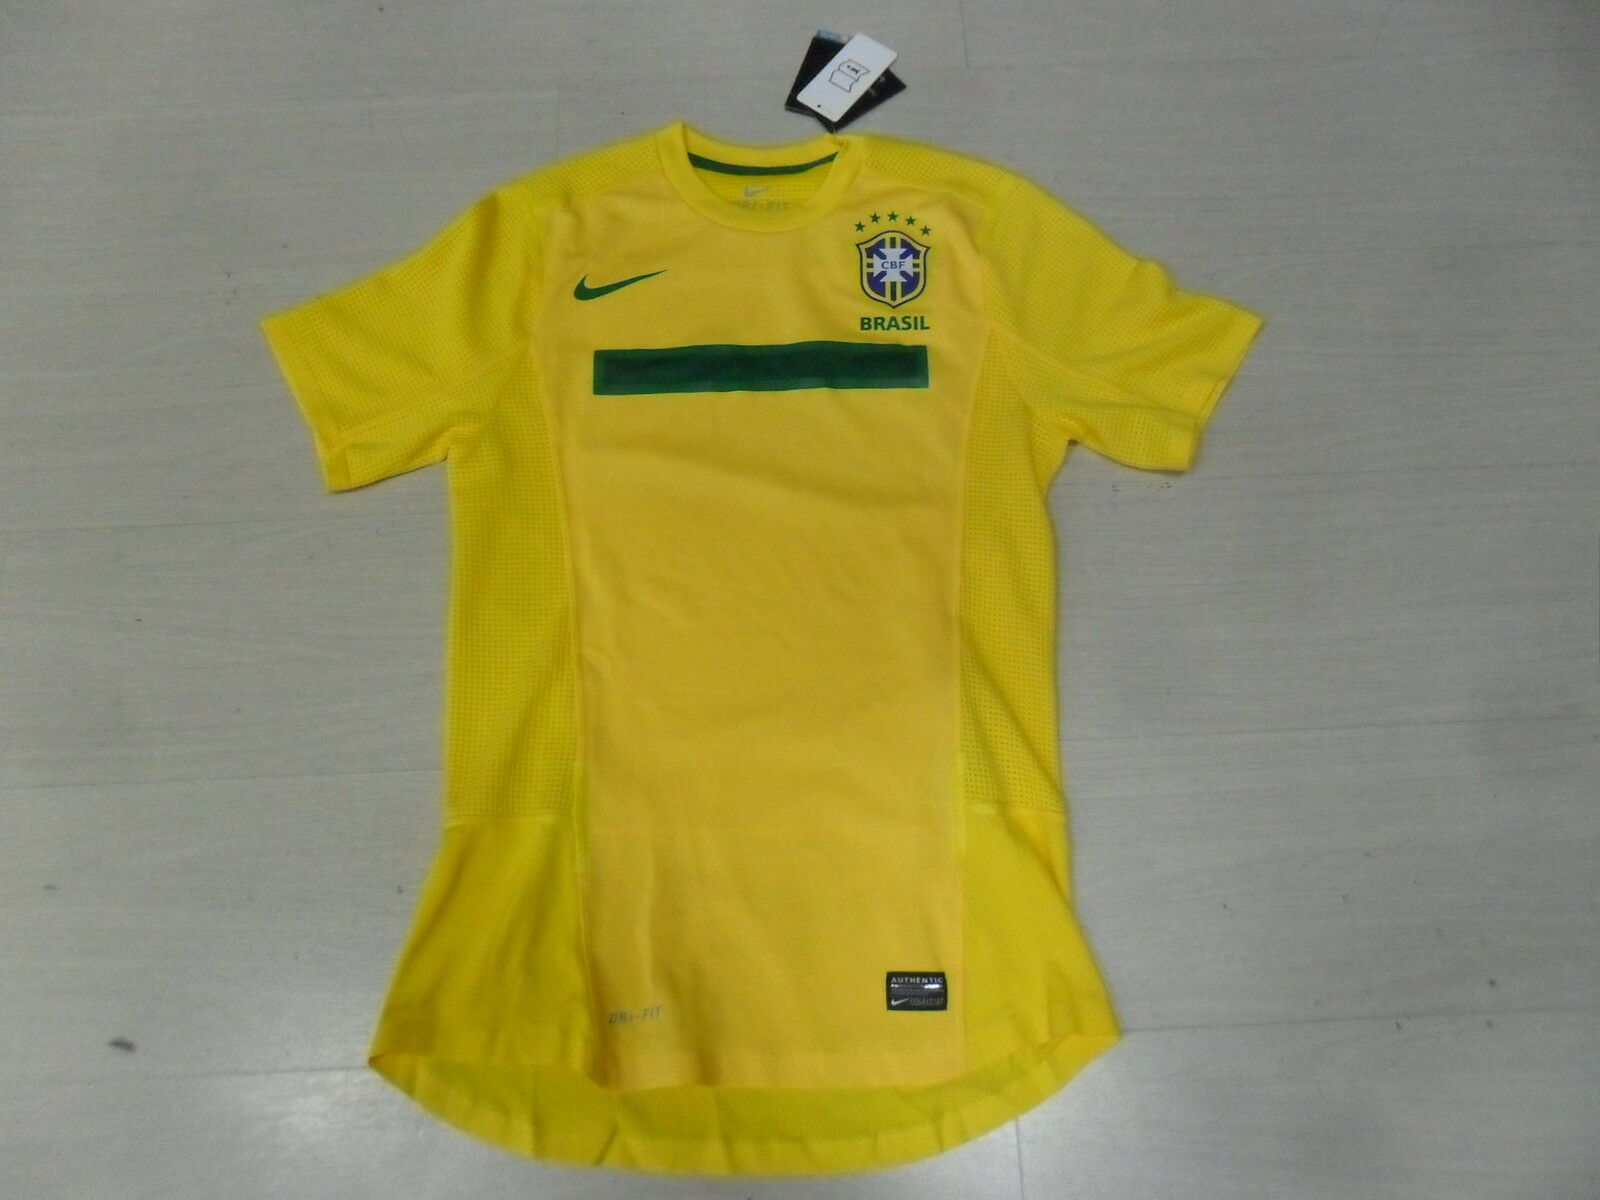 1583 NIKE M BRAZIL BRASIL SHIRT AUTHENTIC T-SHIRT CONFEDERATIONS CUP 2013